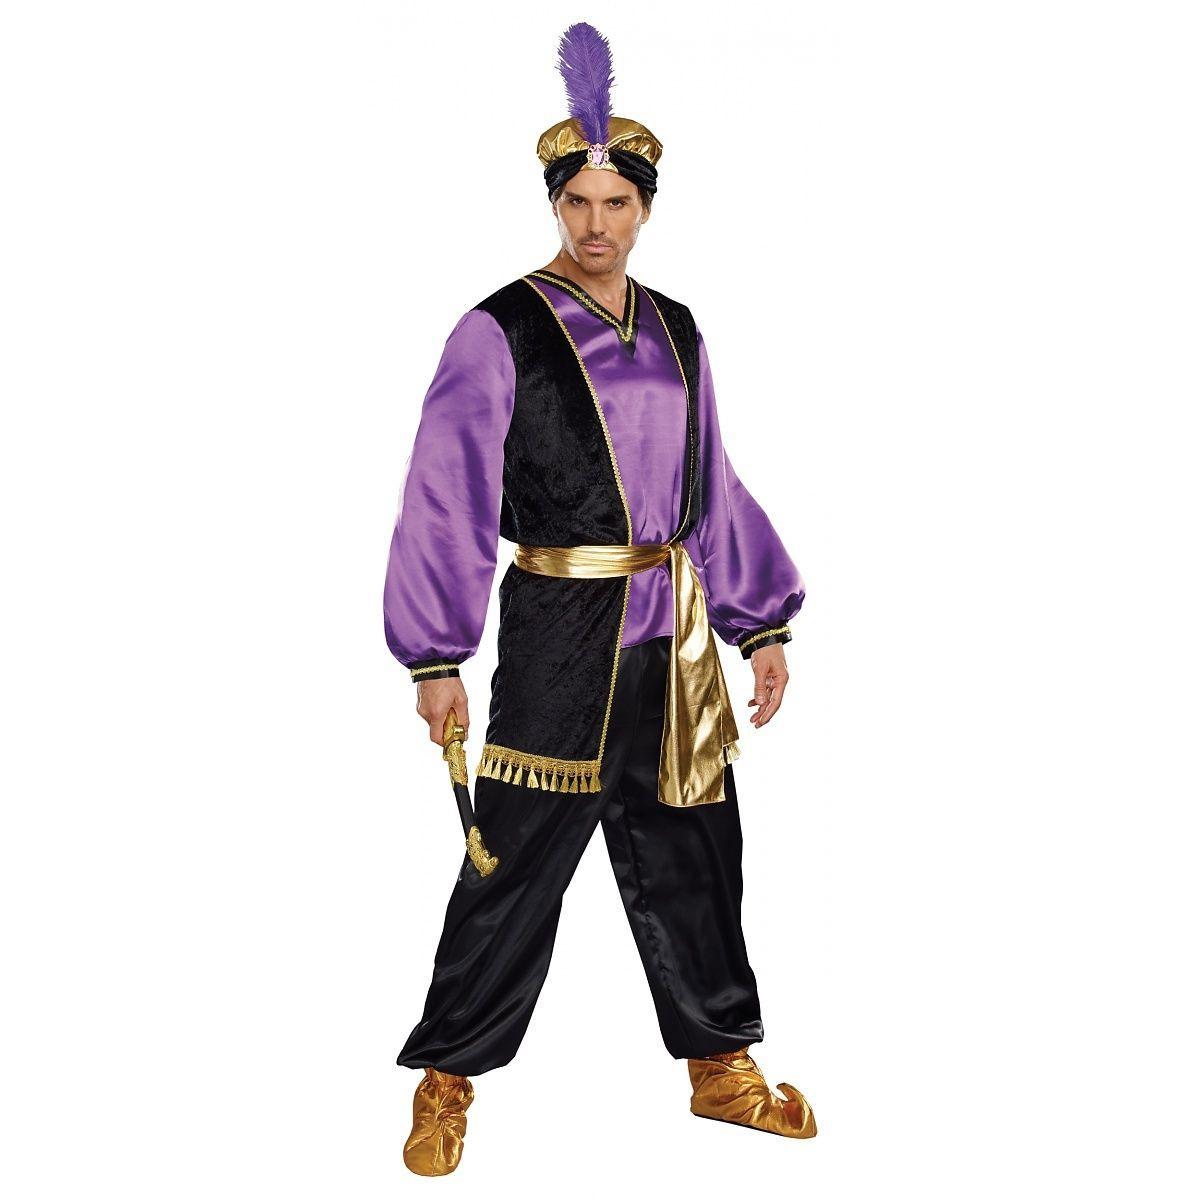 The Sultan Costume Adult Mens Tunic Aladdin Arabian Prince Purple Black Md-XXL  sc 1 st  Dazzling Costumes & The Sultan Costume Adult Mens Tunic Aladdin Arabian Prince Purple ...